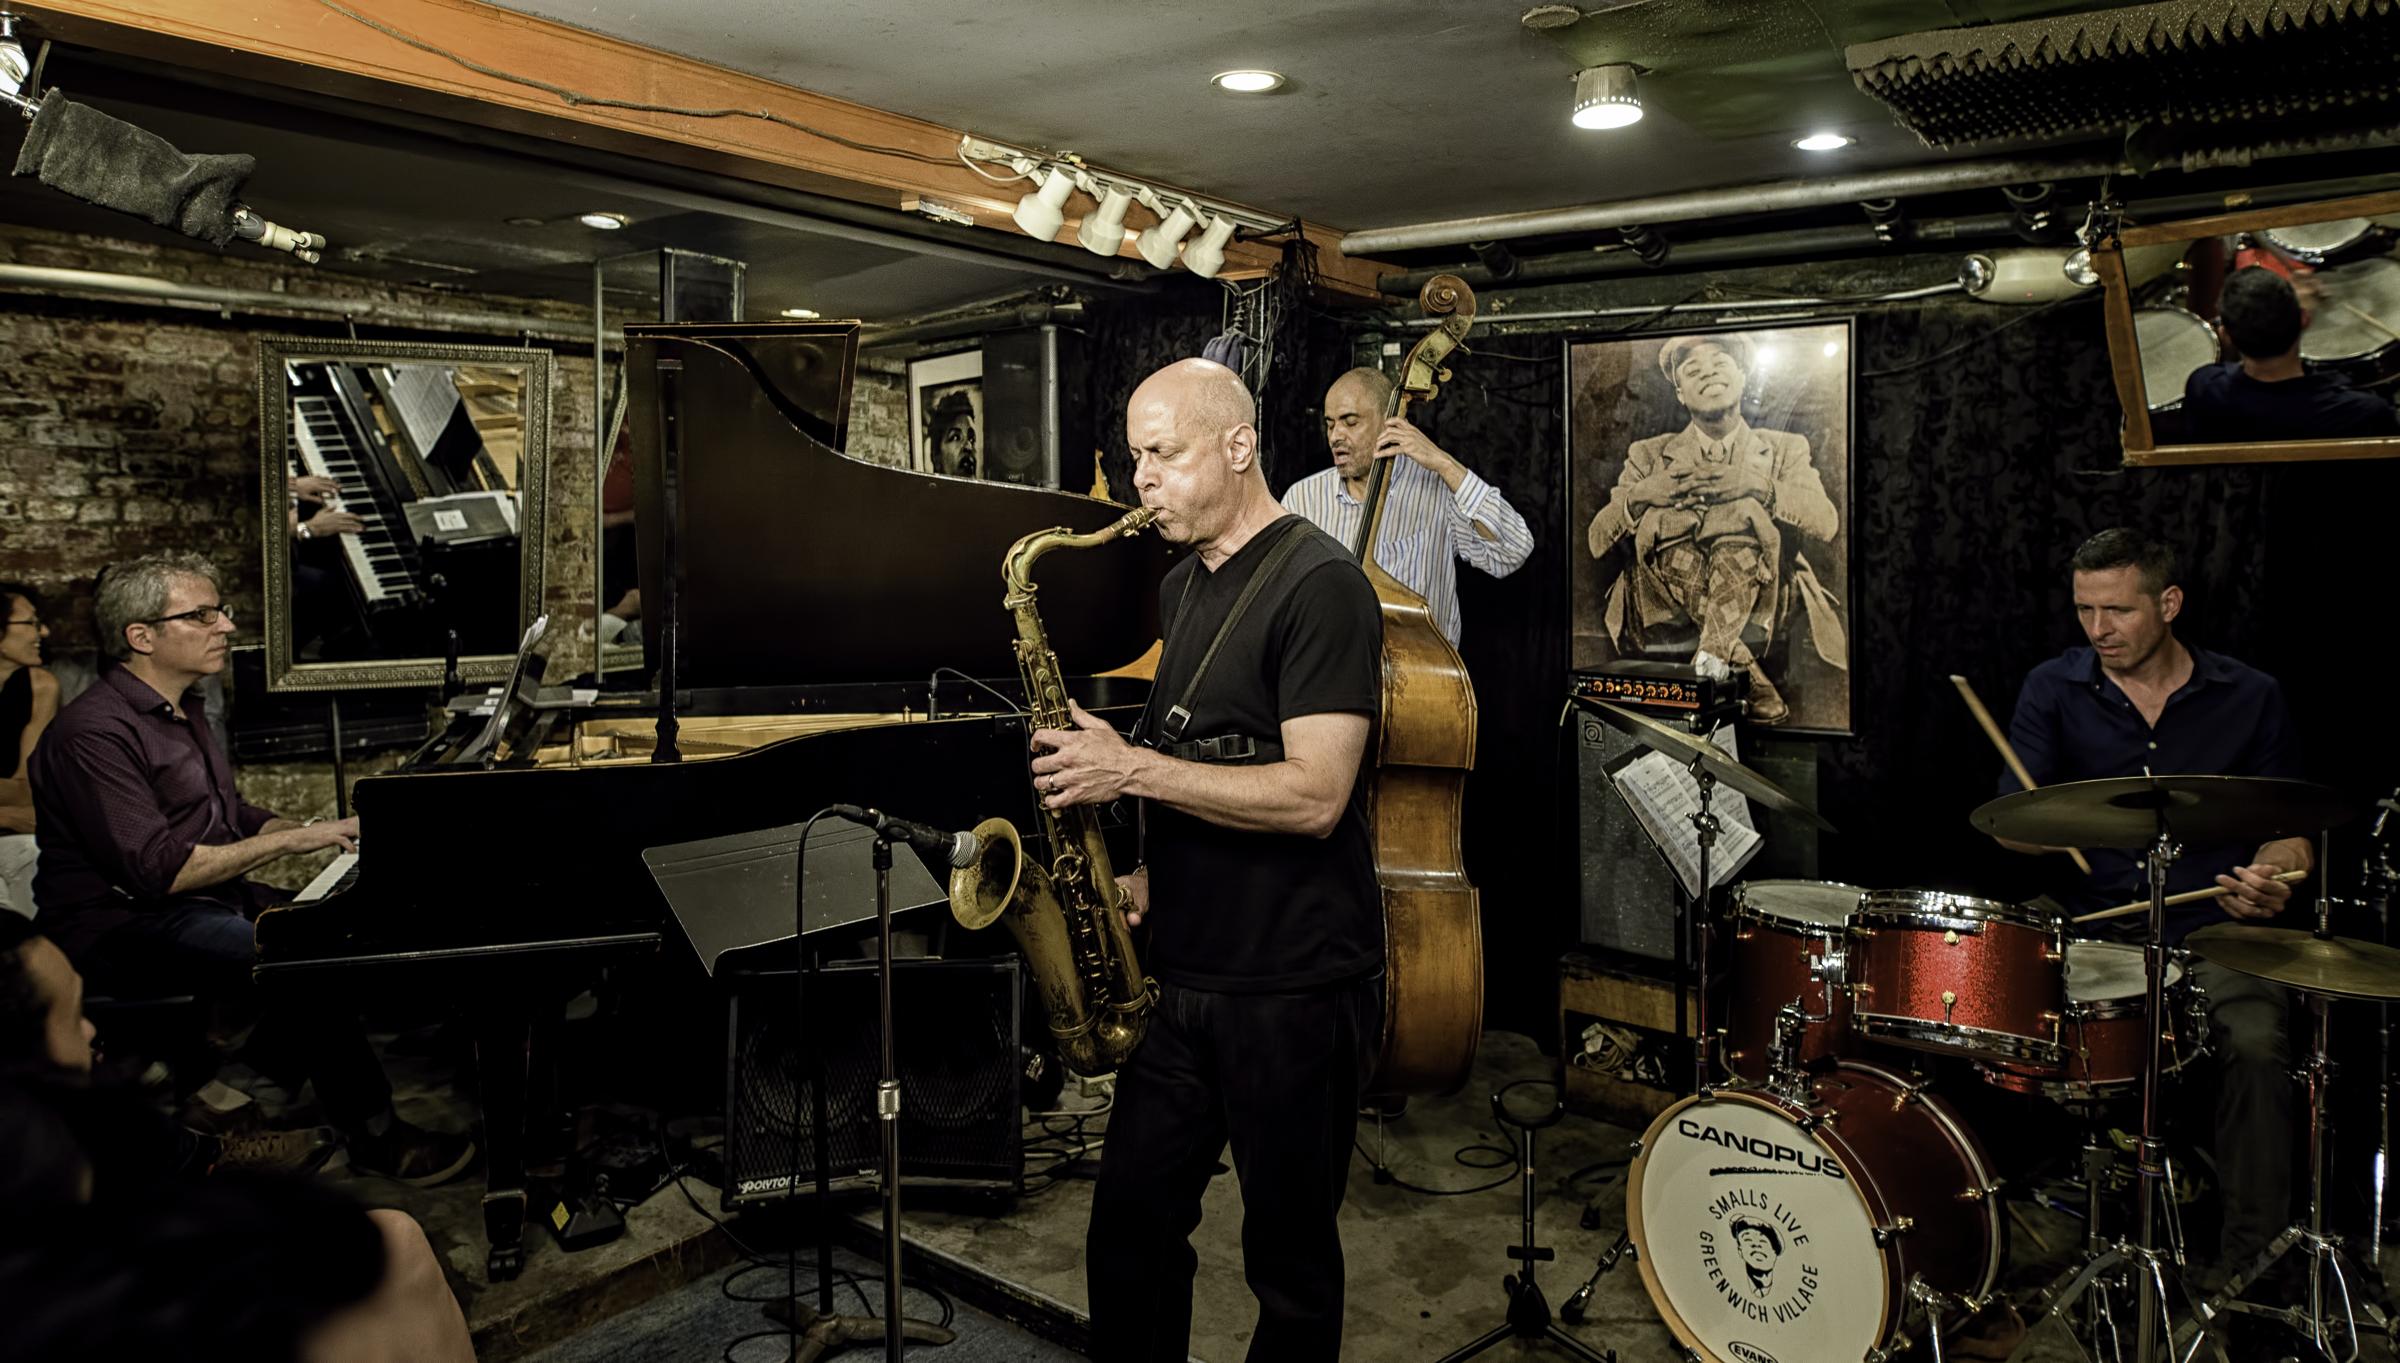 Peter Zak, Walt Weiskopf, Ugonna Okegwa and Jason Tiemann with the Walt Weiskopf Quartet at Smalls Jazz Club